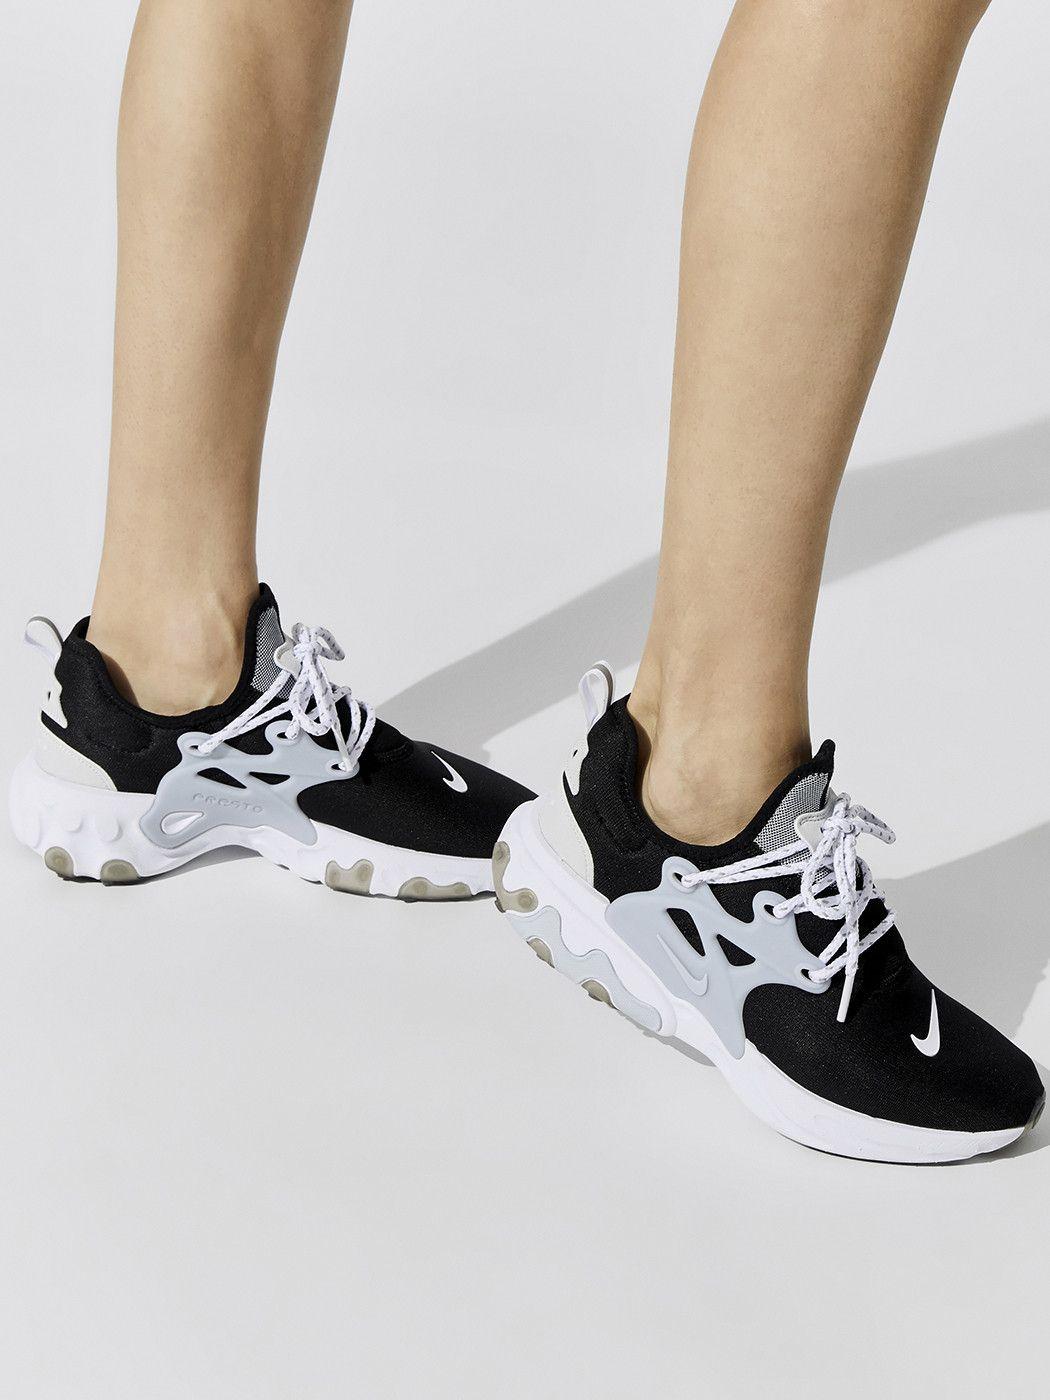 jugar Elevado Terminal  Nike React Presto in sky grey photon dust | Nike, Womens sneakers, Nike  presto